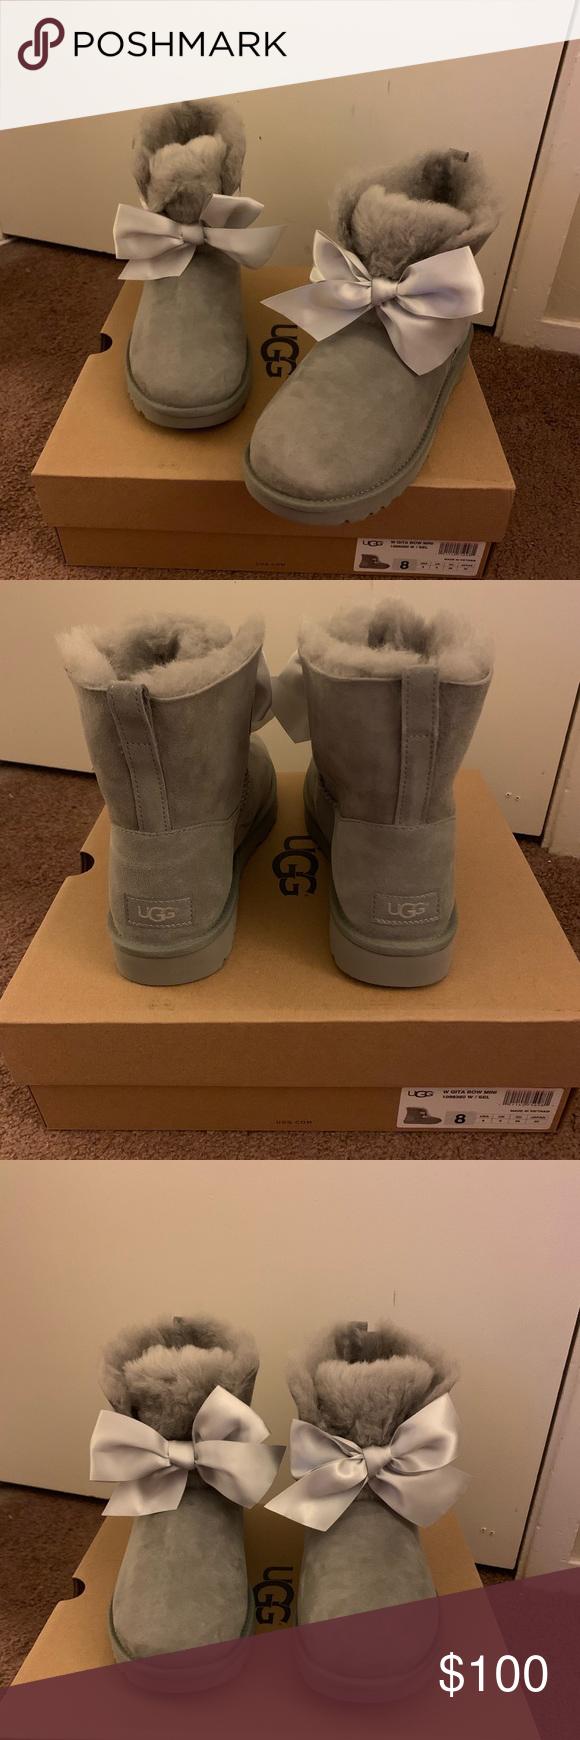 NIB UGG Gita Bow Mini Boots Women size 8 100% Authentic